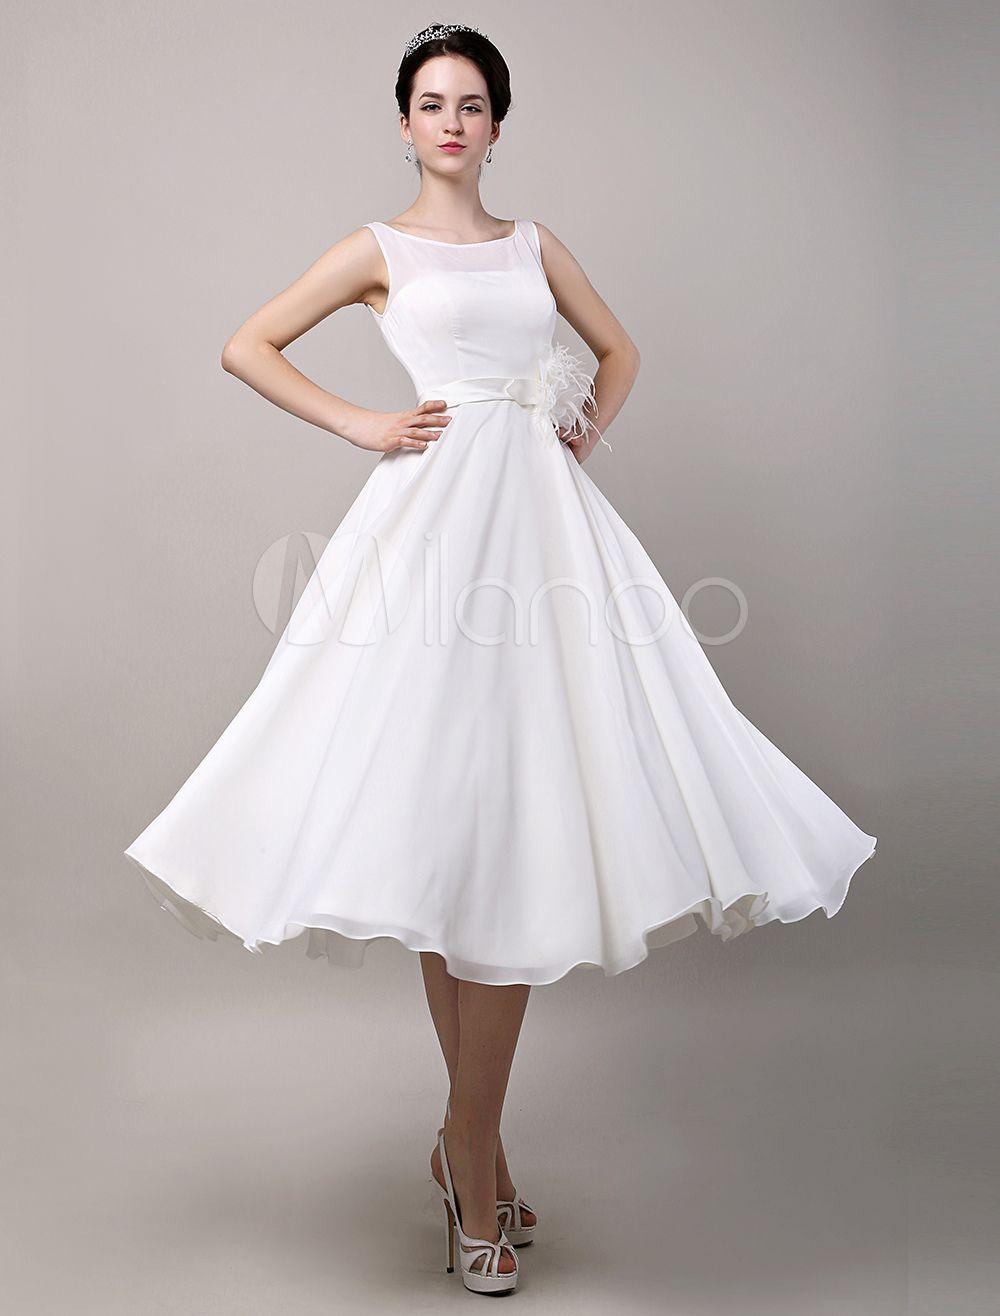 Wedding dresses tea length  Vintage Retro Chiffon Tea Length Wedding Dress  Wedding dresses